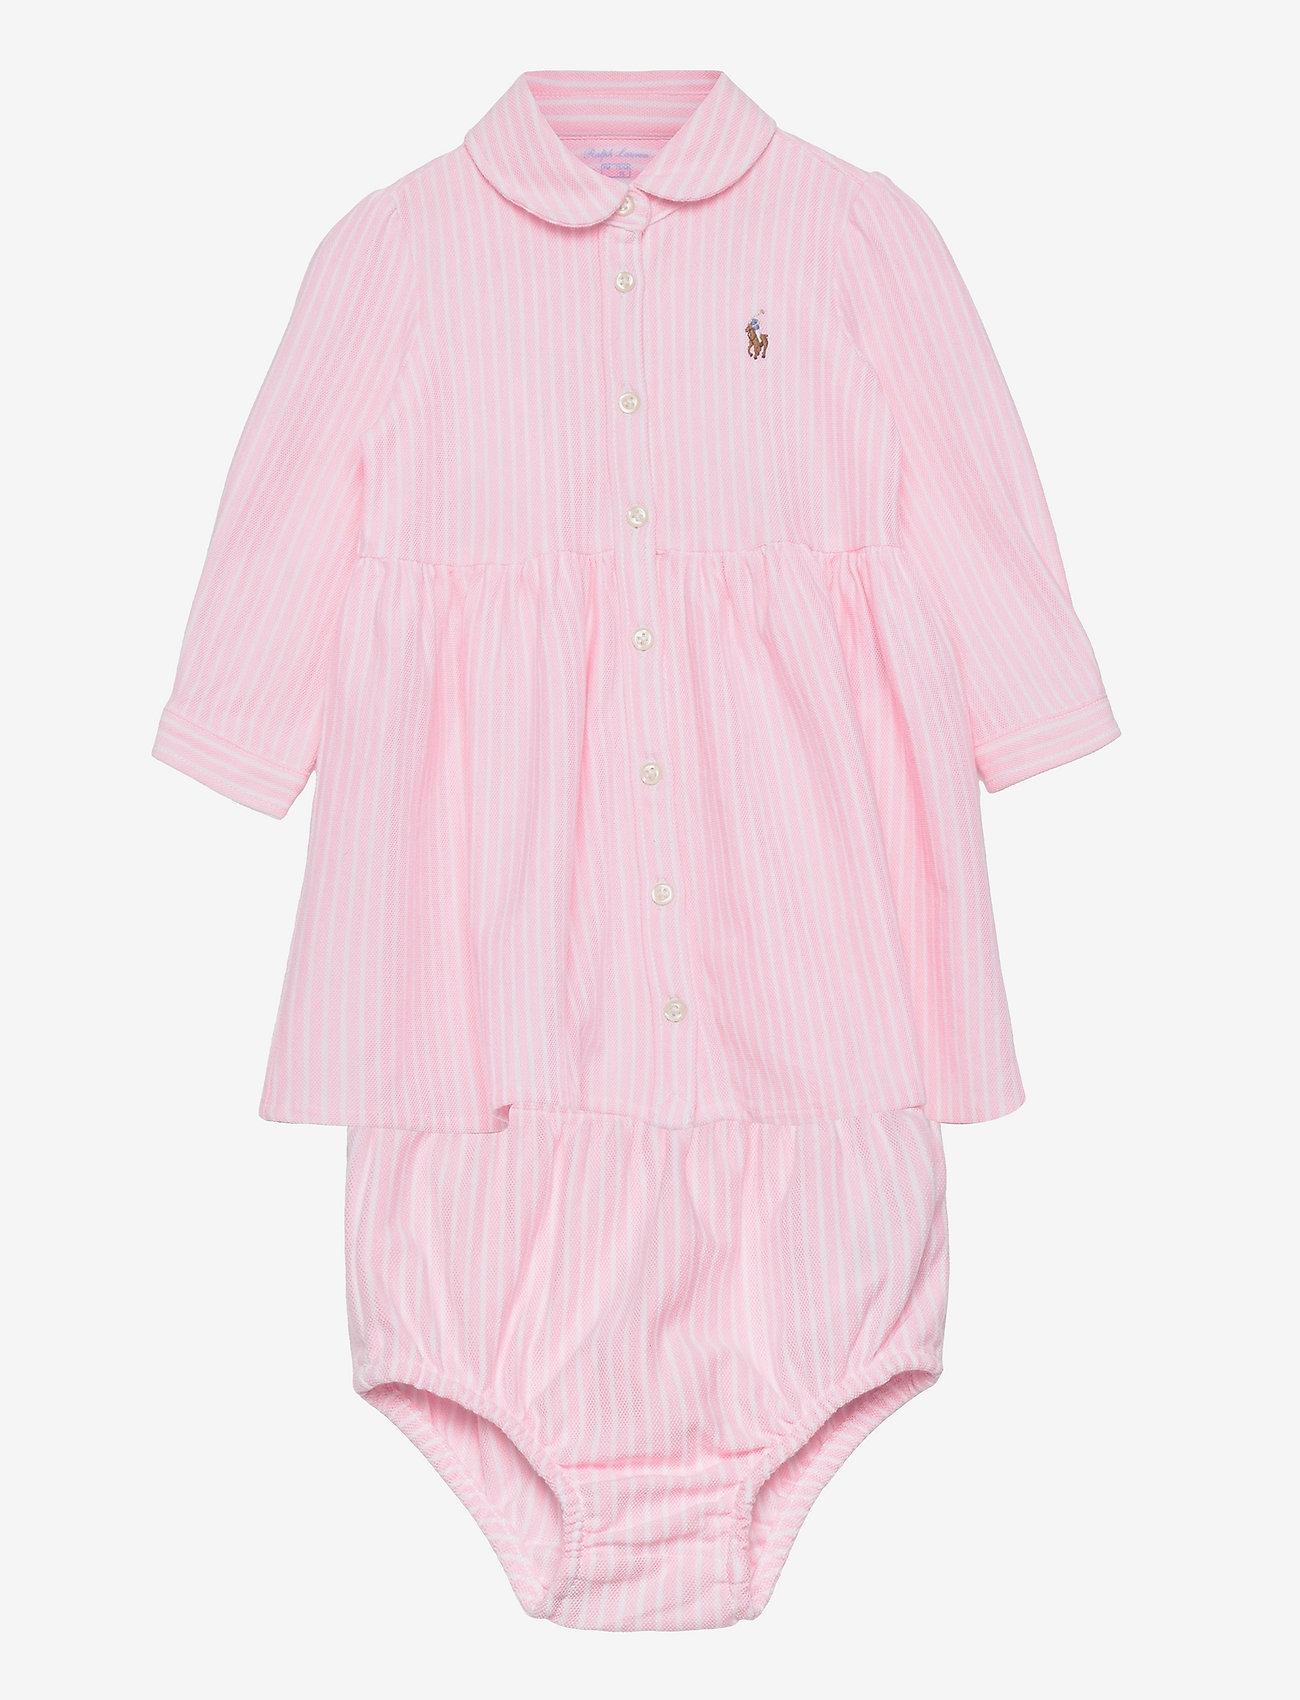 Ralph Lauren Baby - Striped Oxford Dress & Bloomer - dresses - carmel pink/white - 0